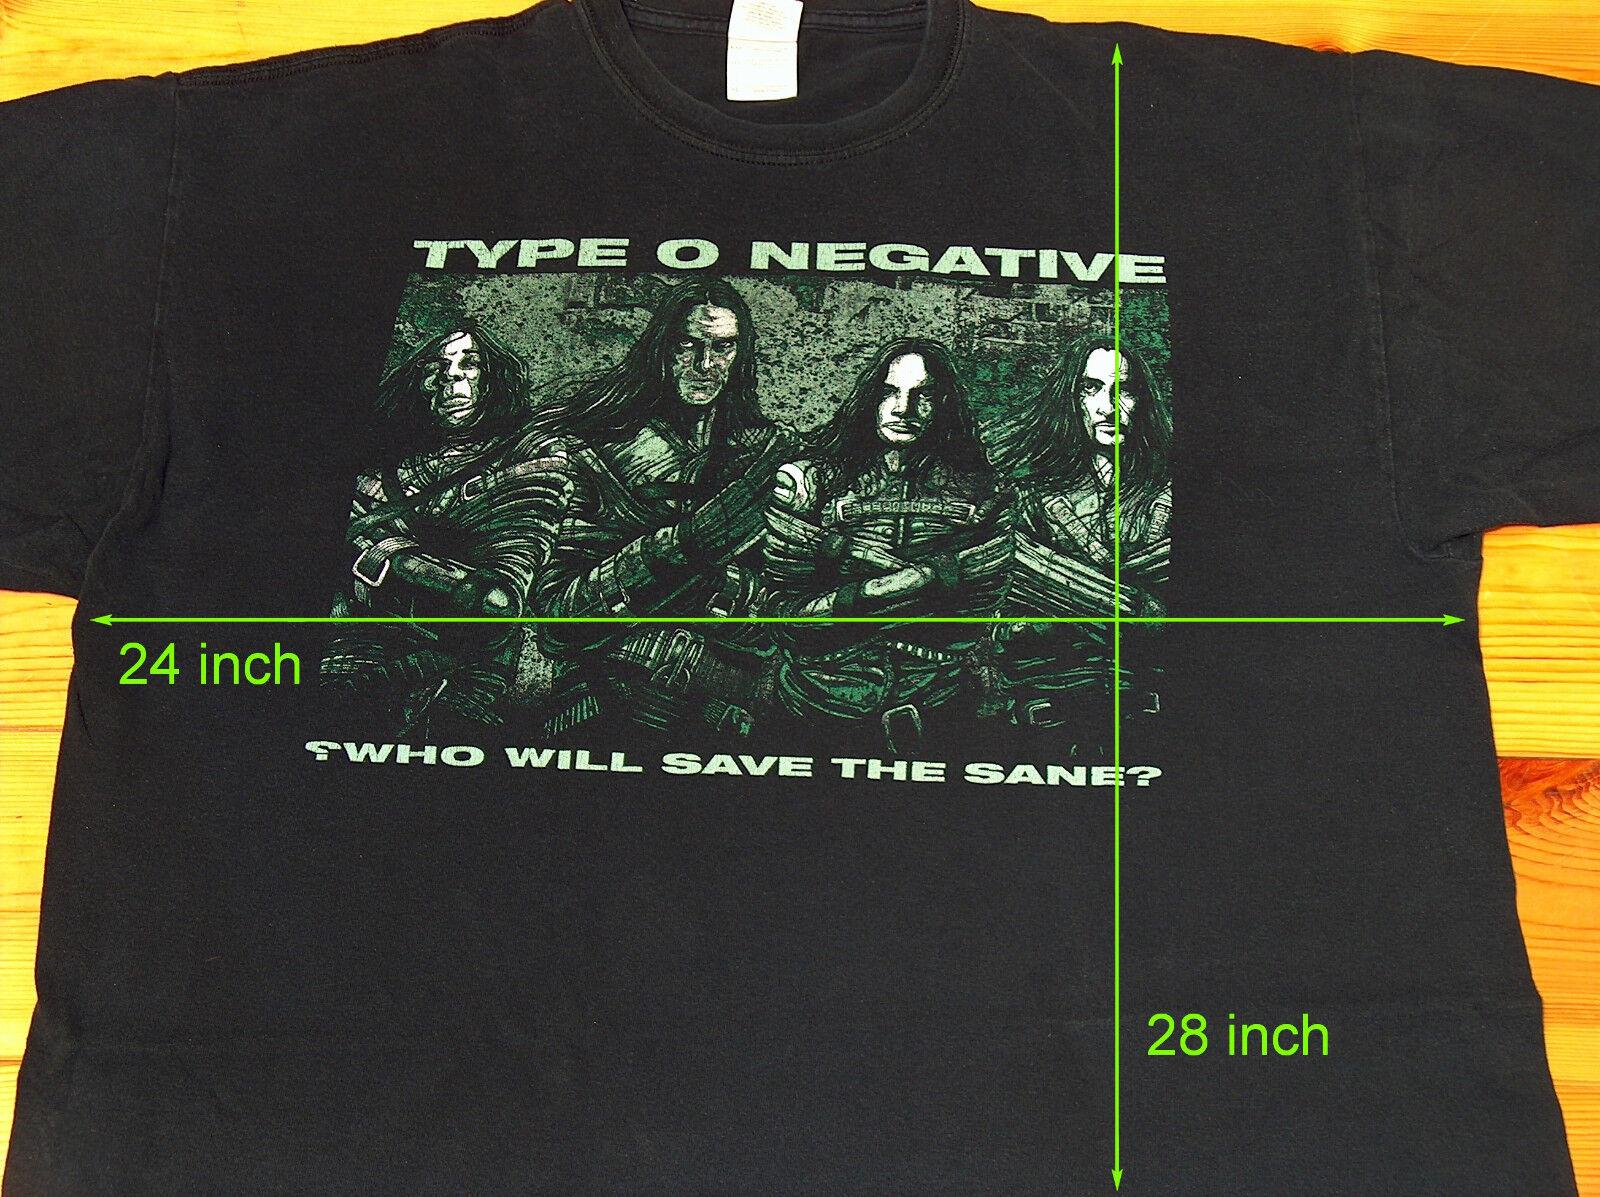 ⛔️ TYPE O NEGATIVE ⛔️ All Hallows Evil Tour 2009 Shirt XL ⛔️ CARNIVORE ⛔️ STEELE